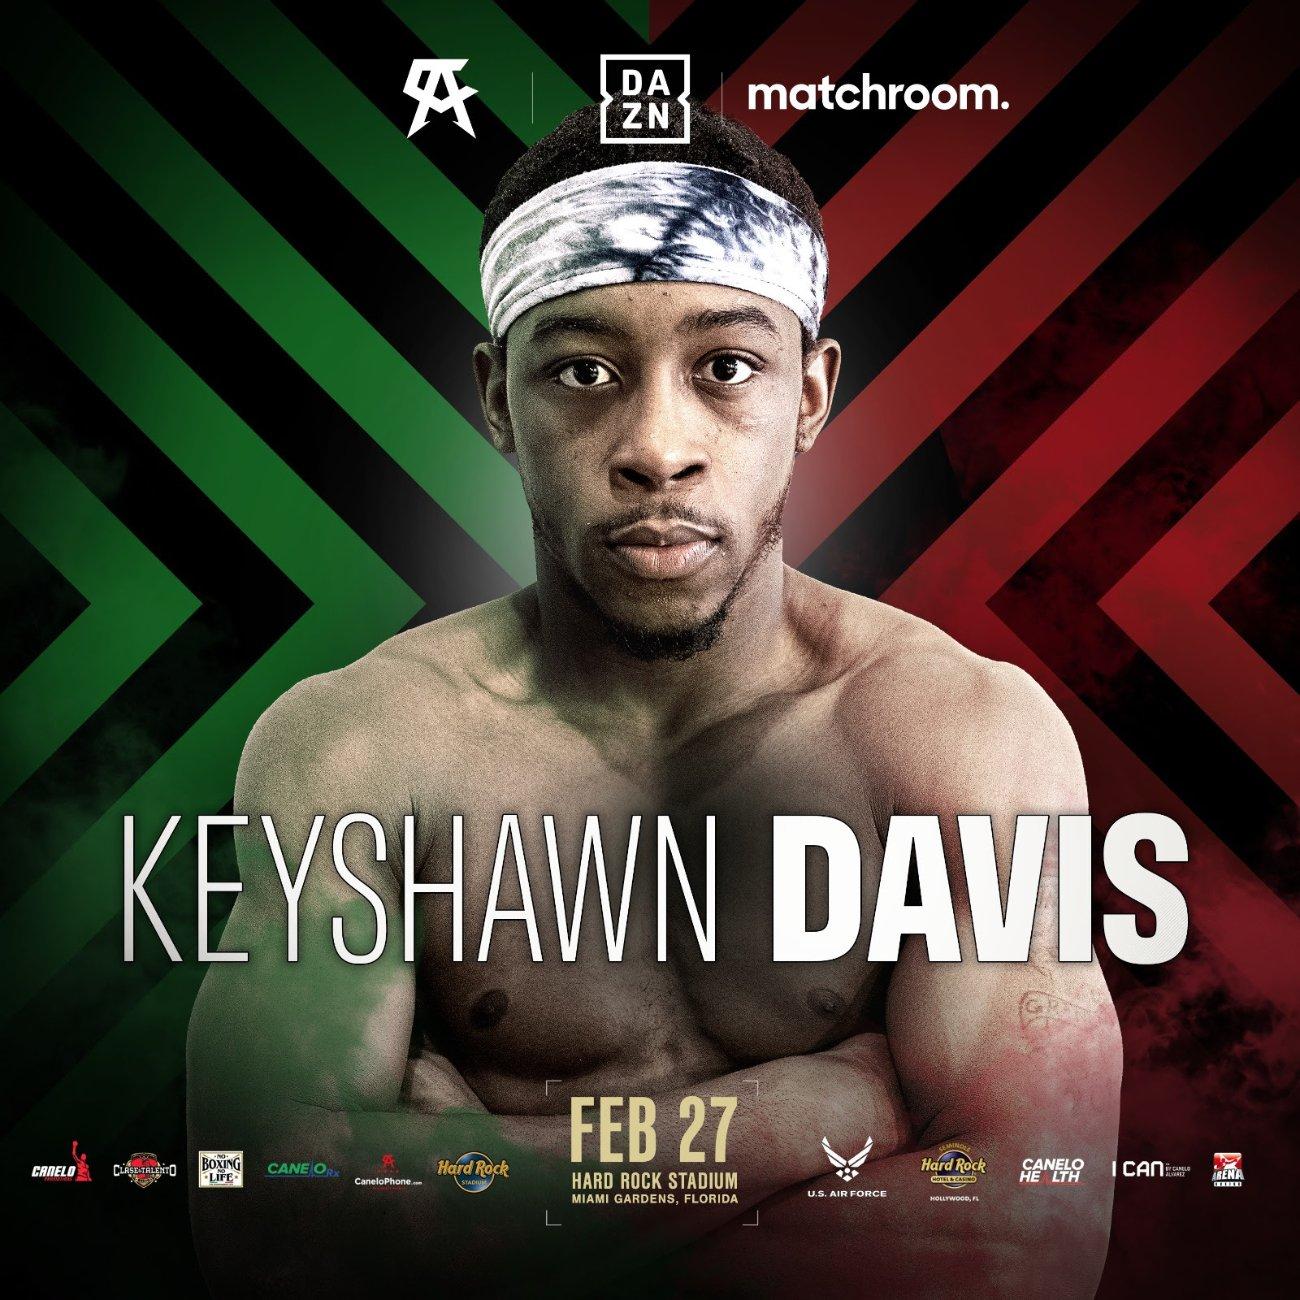 Keyshawn Davis - Keyshawn Davis